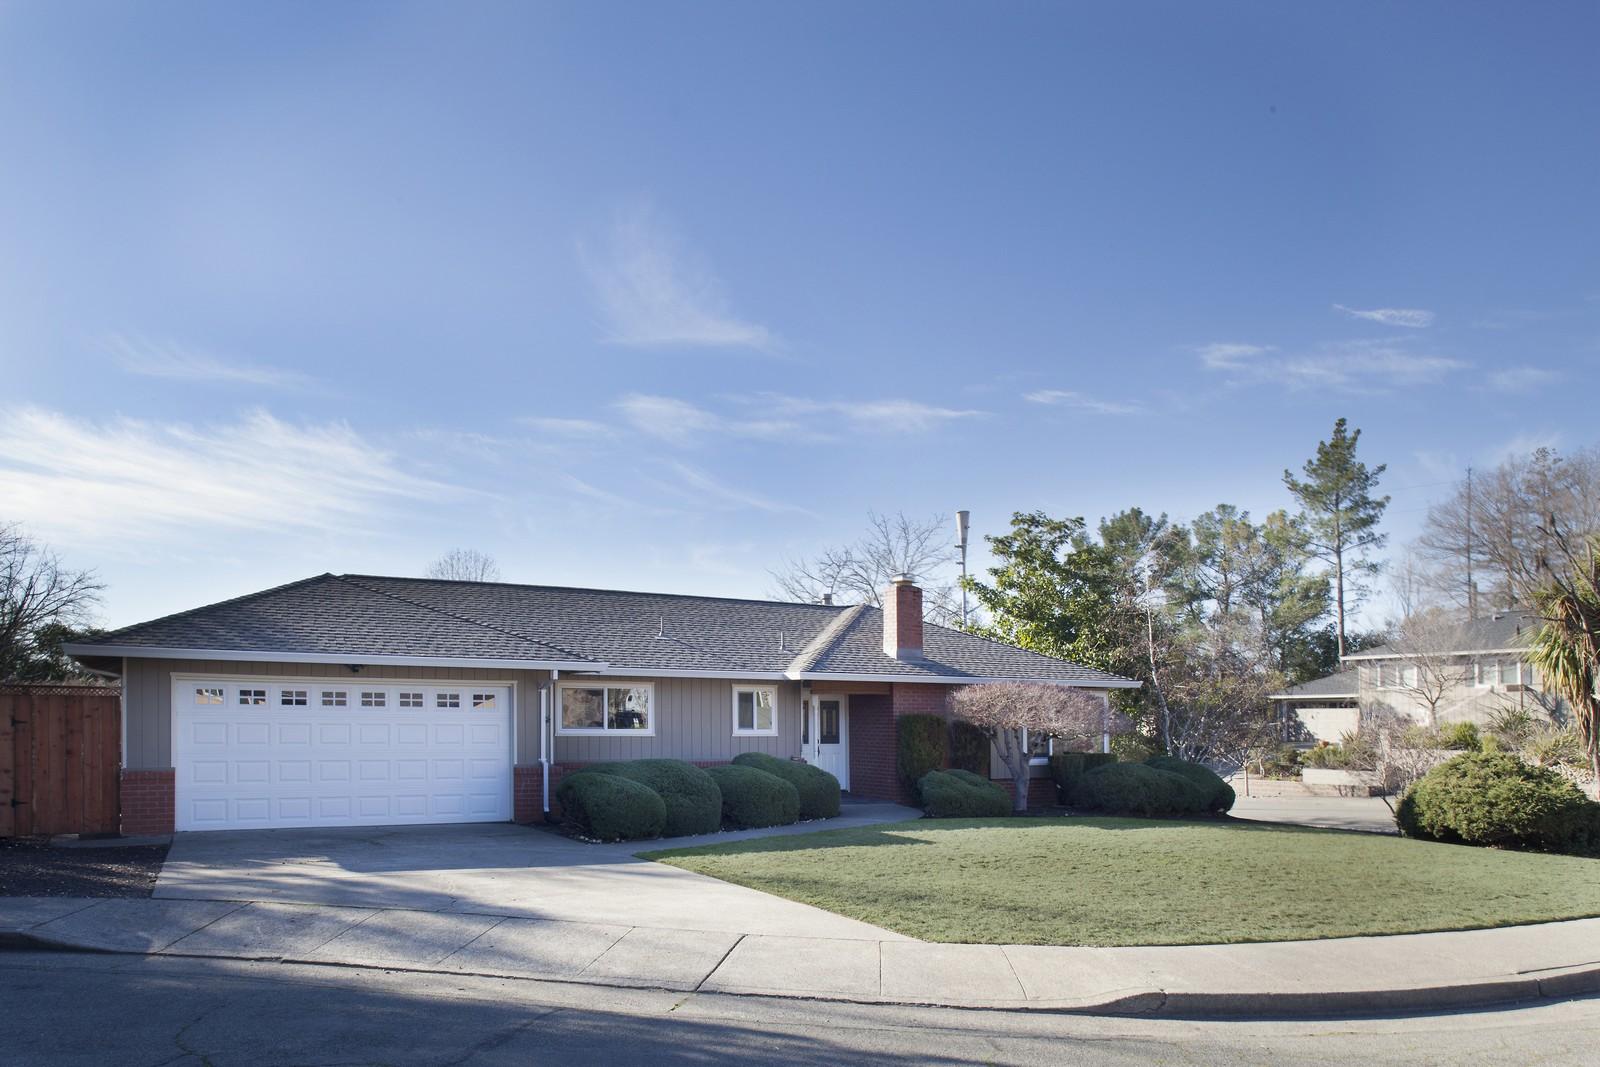 Single Family Home for Sale at 1 Quixote Court Santa Rosa, California 95409 United States